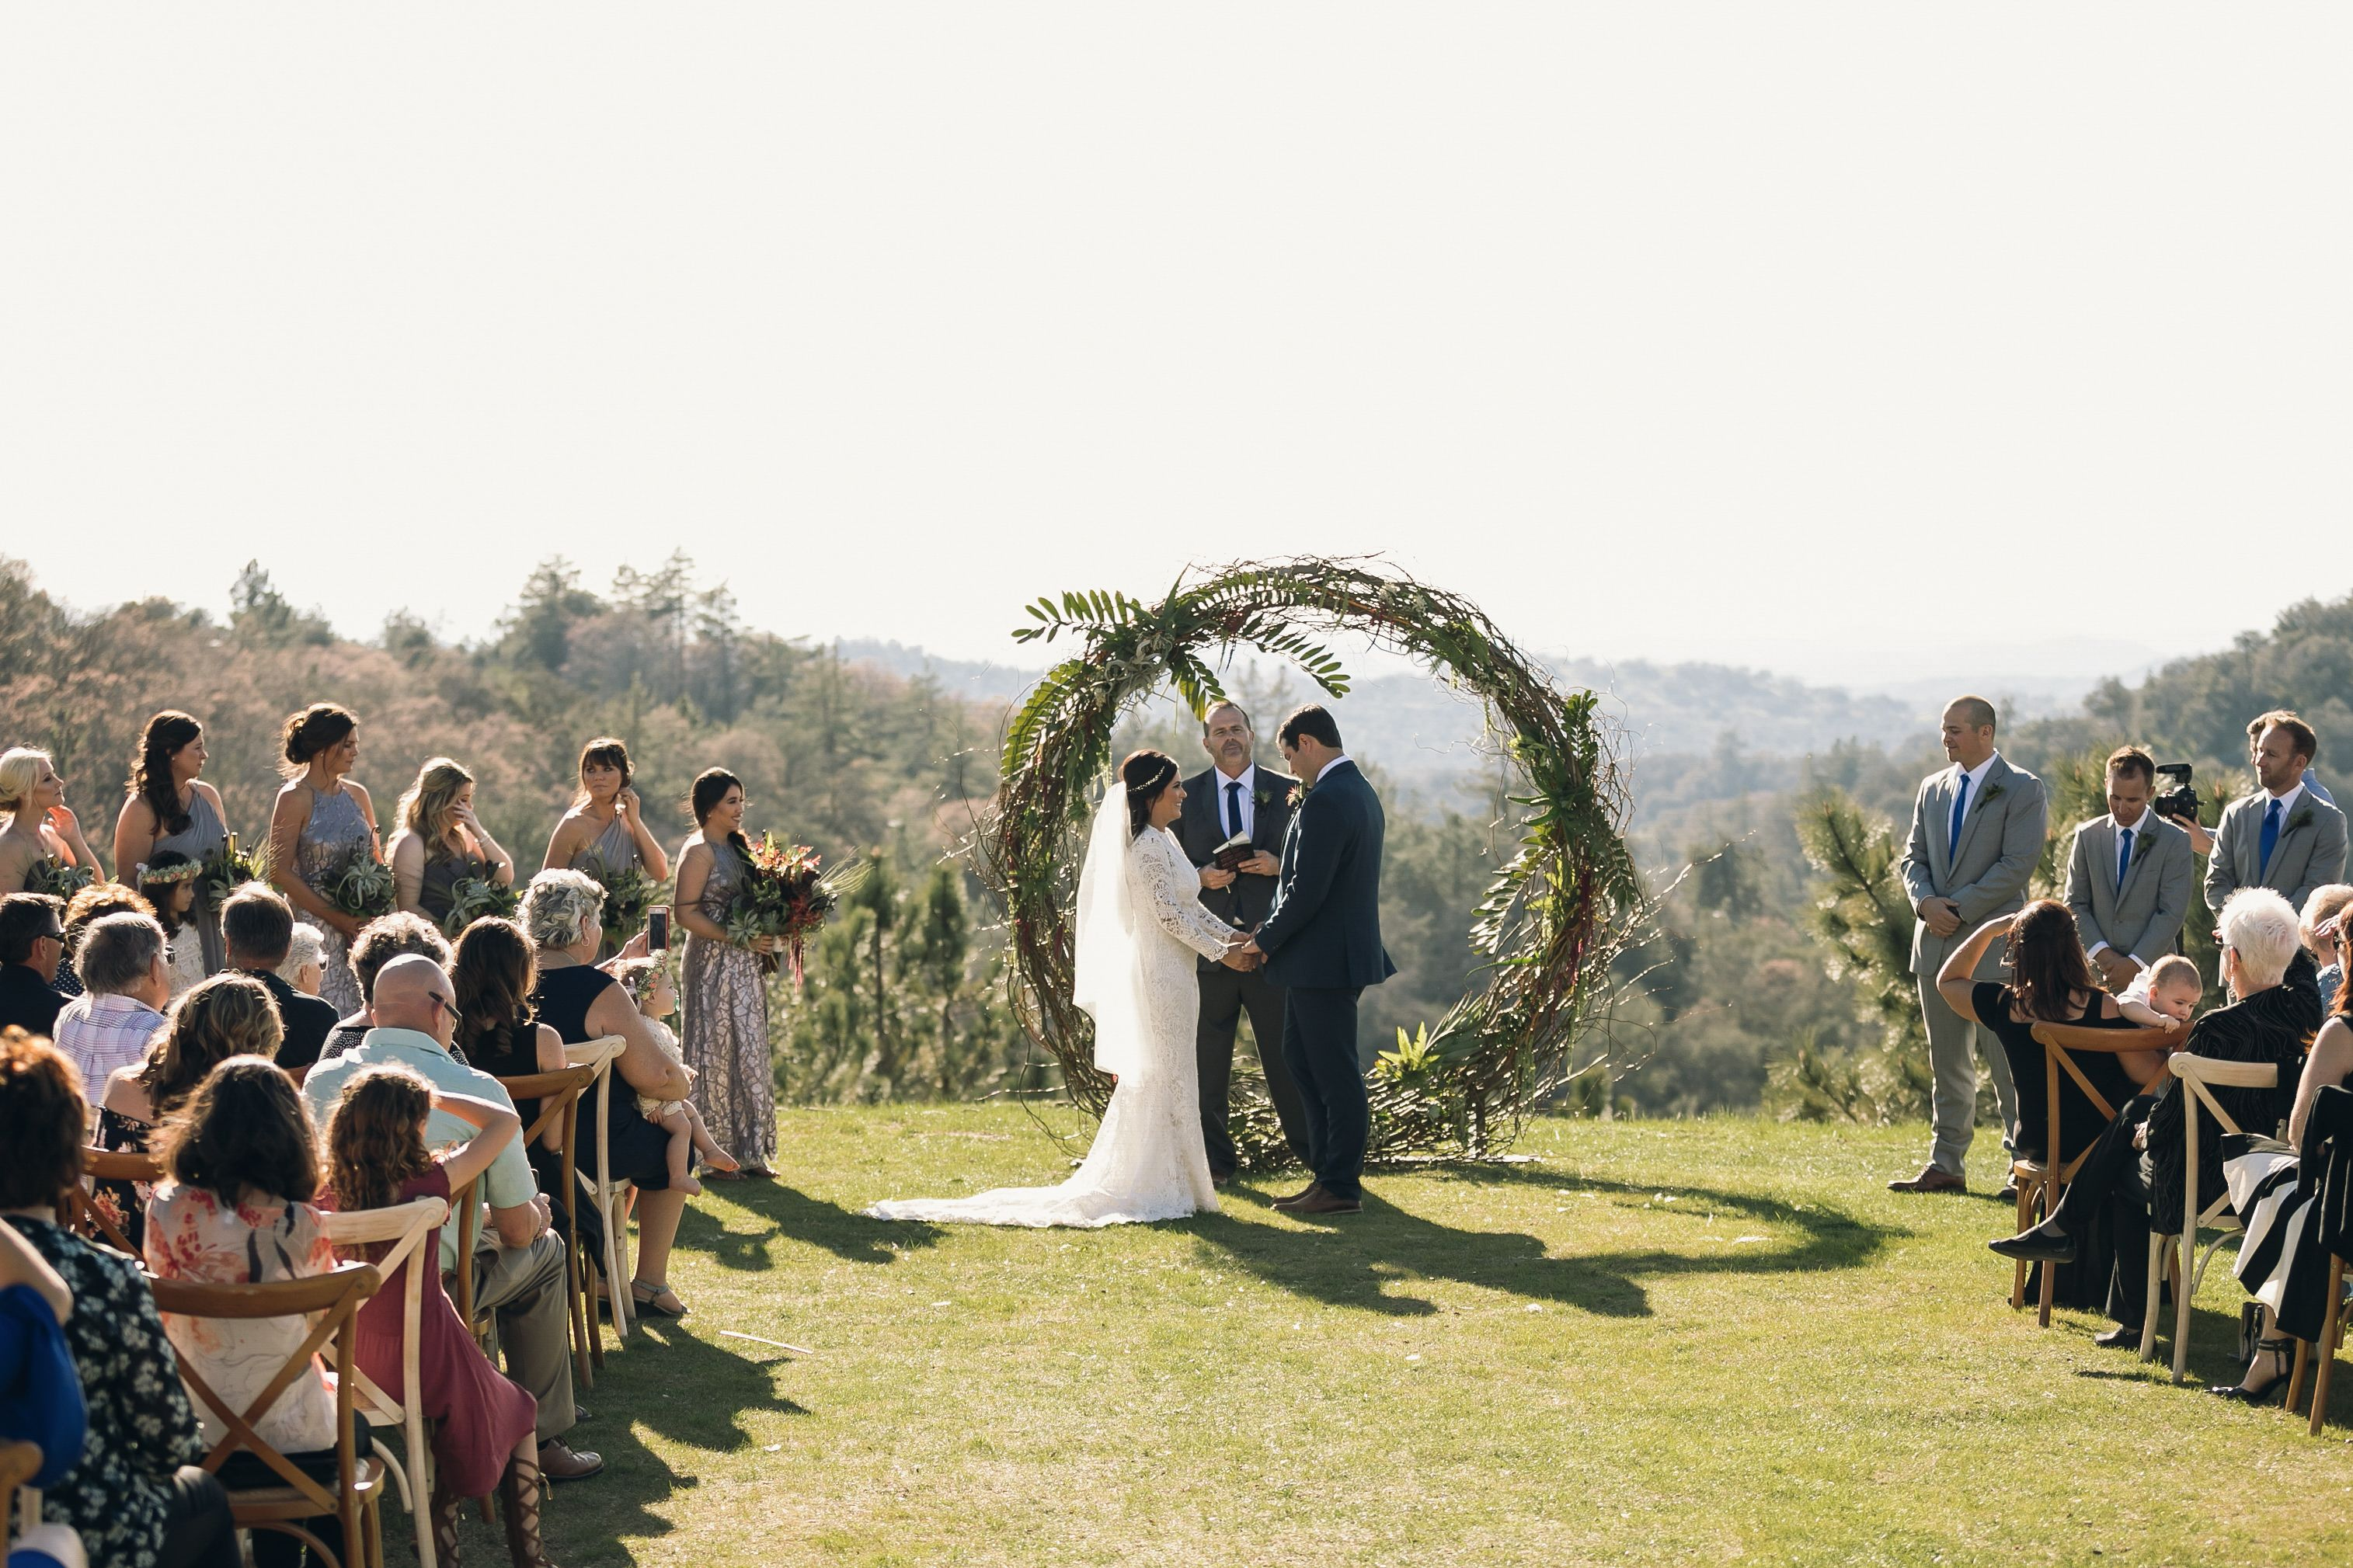 Circle c arch 1 wedding ceremony arch wedding ceremony